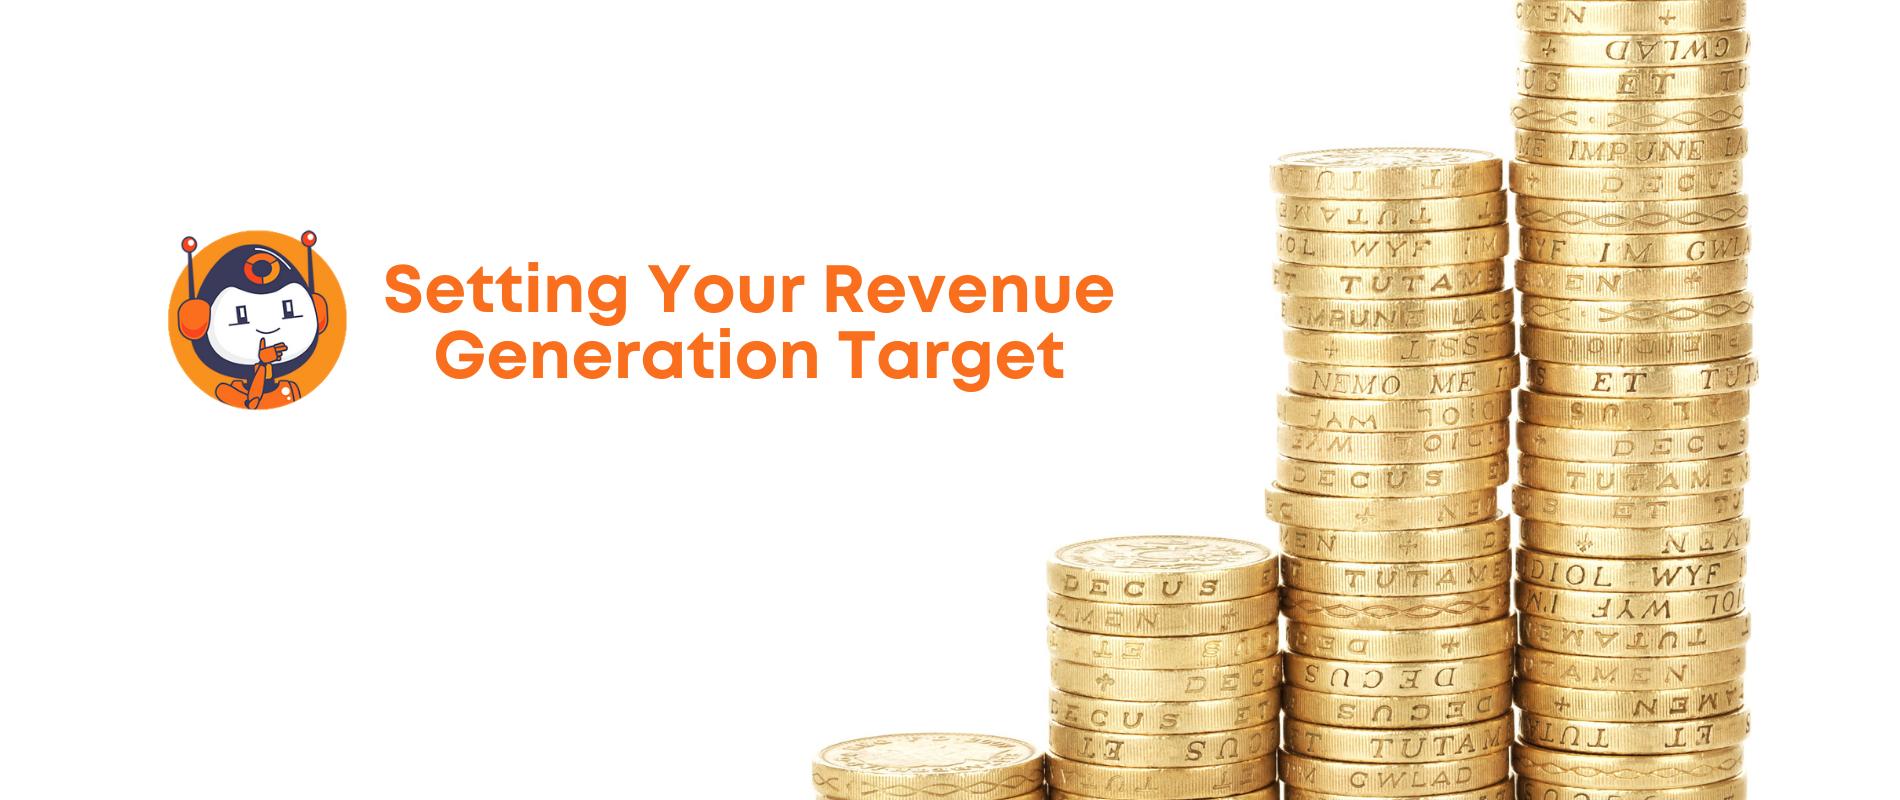 Setting your revenue generation target